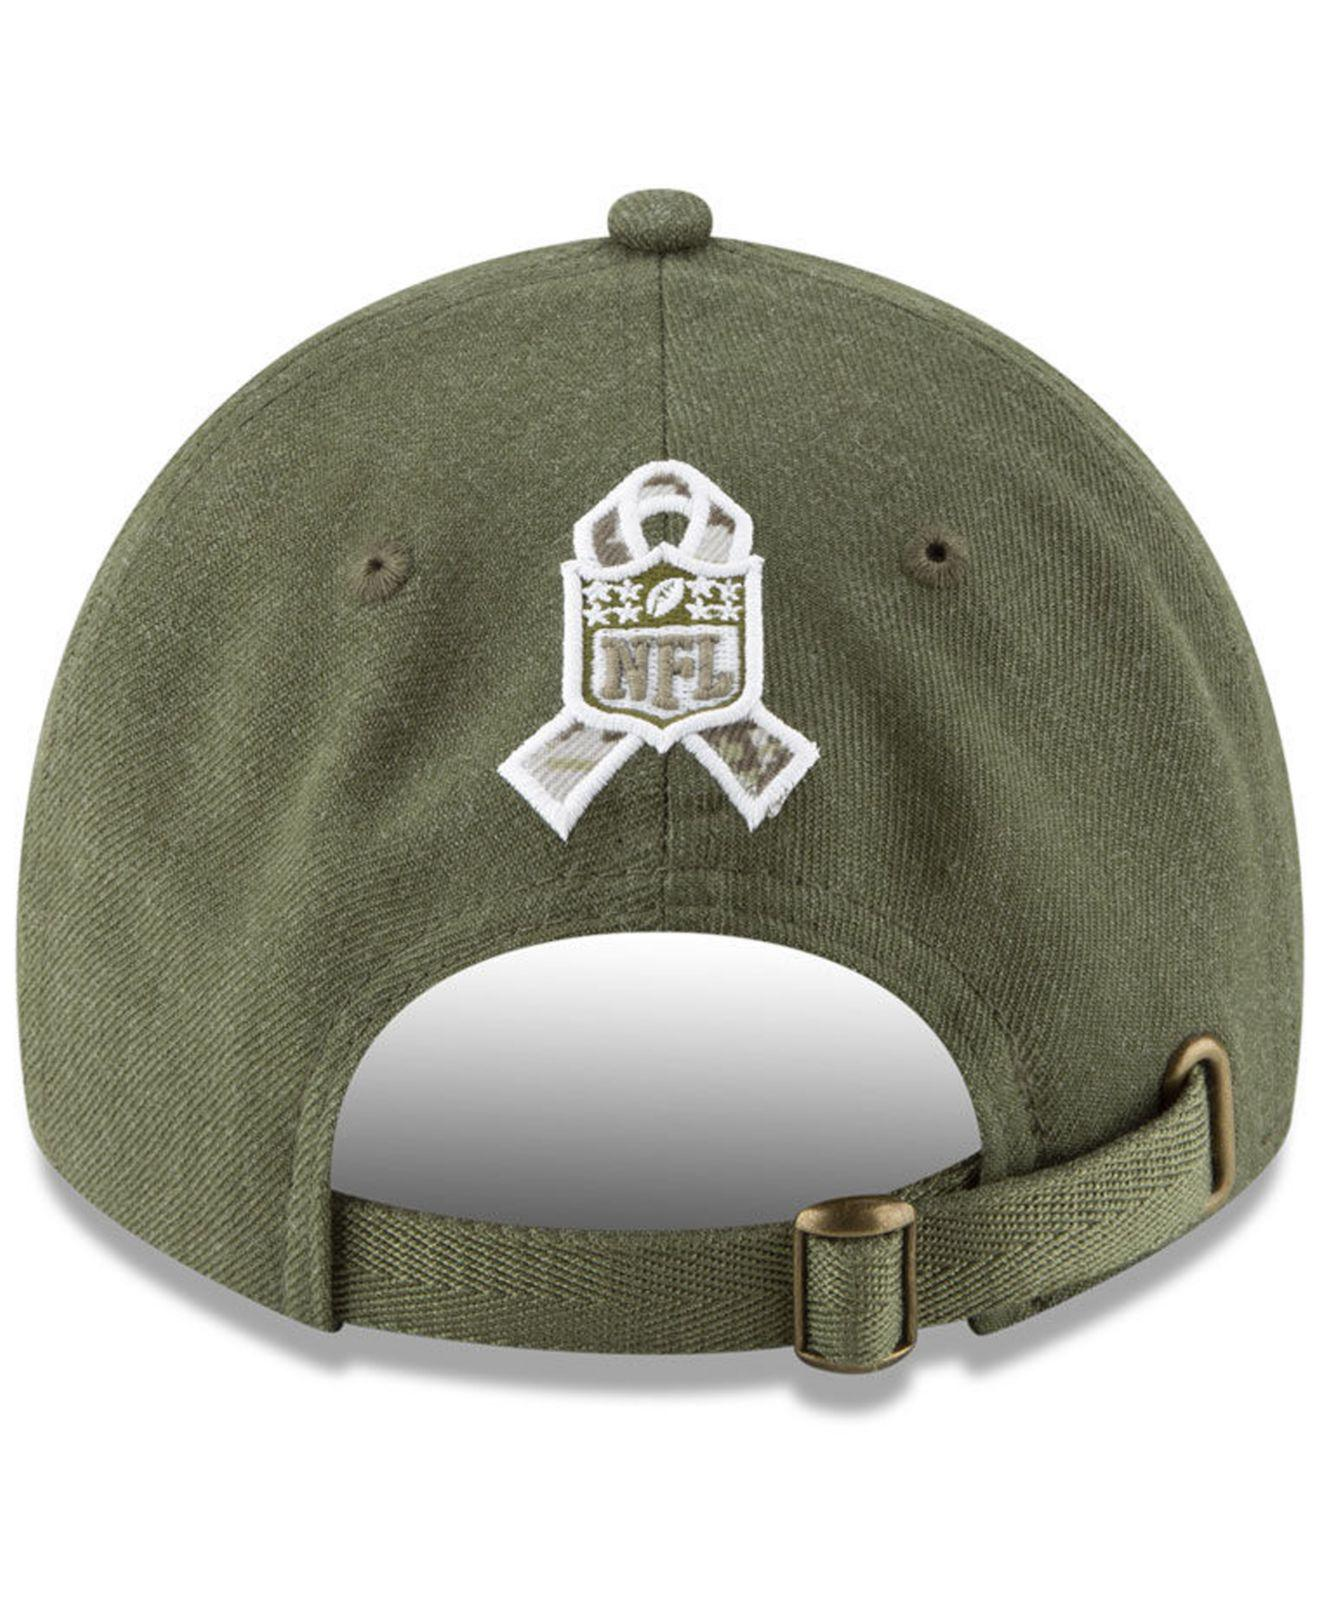 brand new ab6c9 57c9e Lyst - KTZ Arizona Cardinals Salute To Service 9twenty Cap in Green for Men  - Save 40%